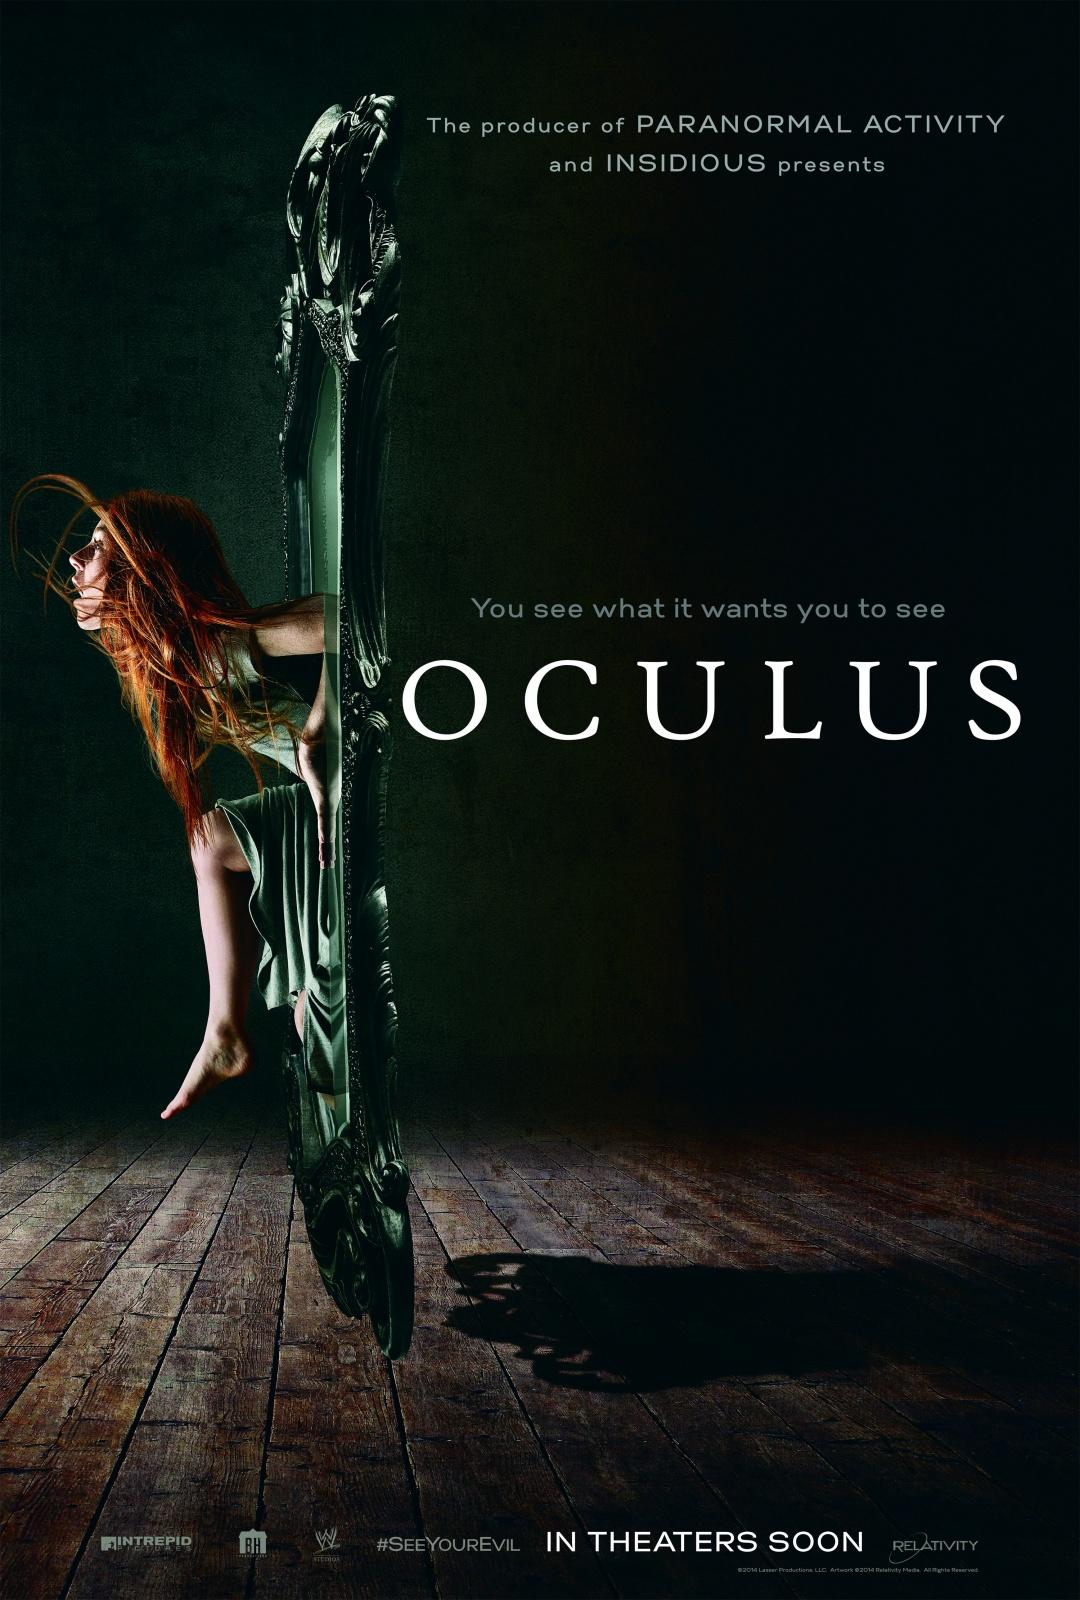 Oculus Movie Film Trailer 2014 - Sinopsis